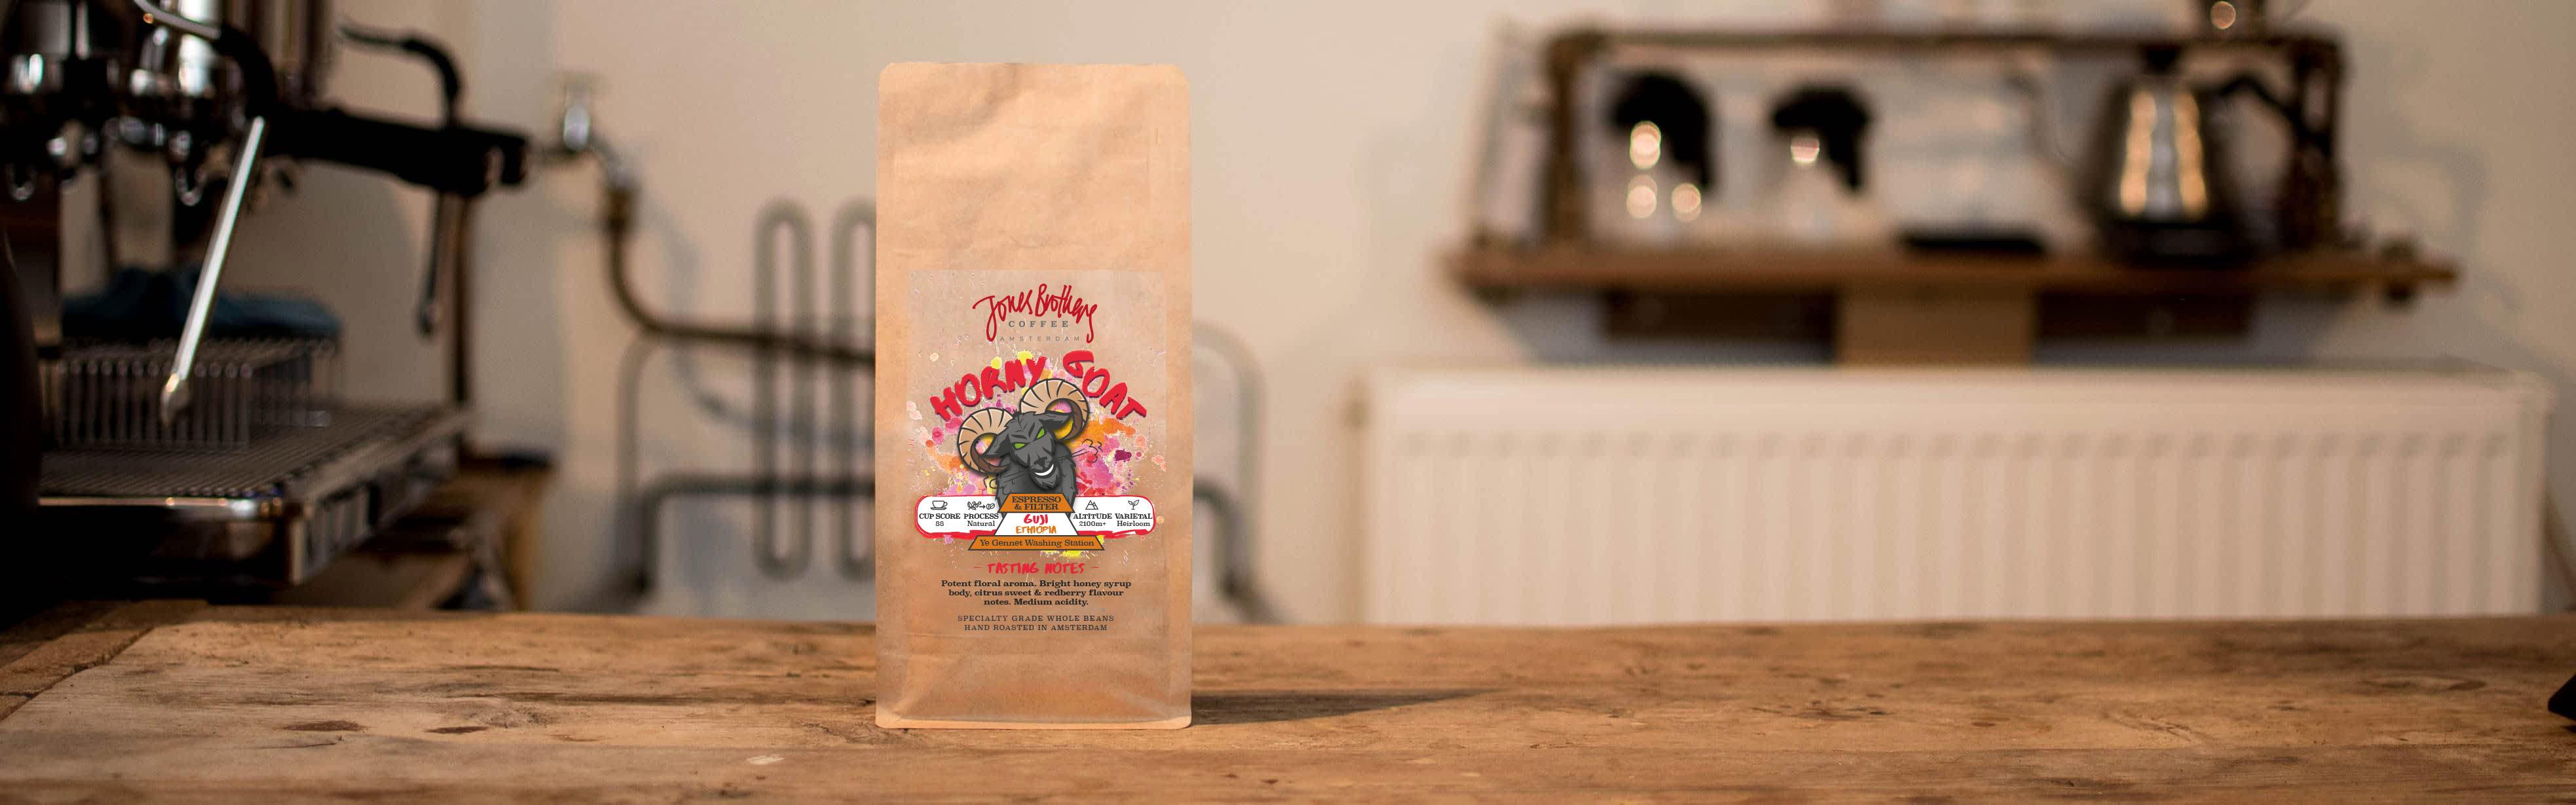 Horny Goat Guji specialty coffee